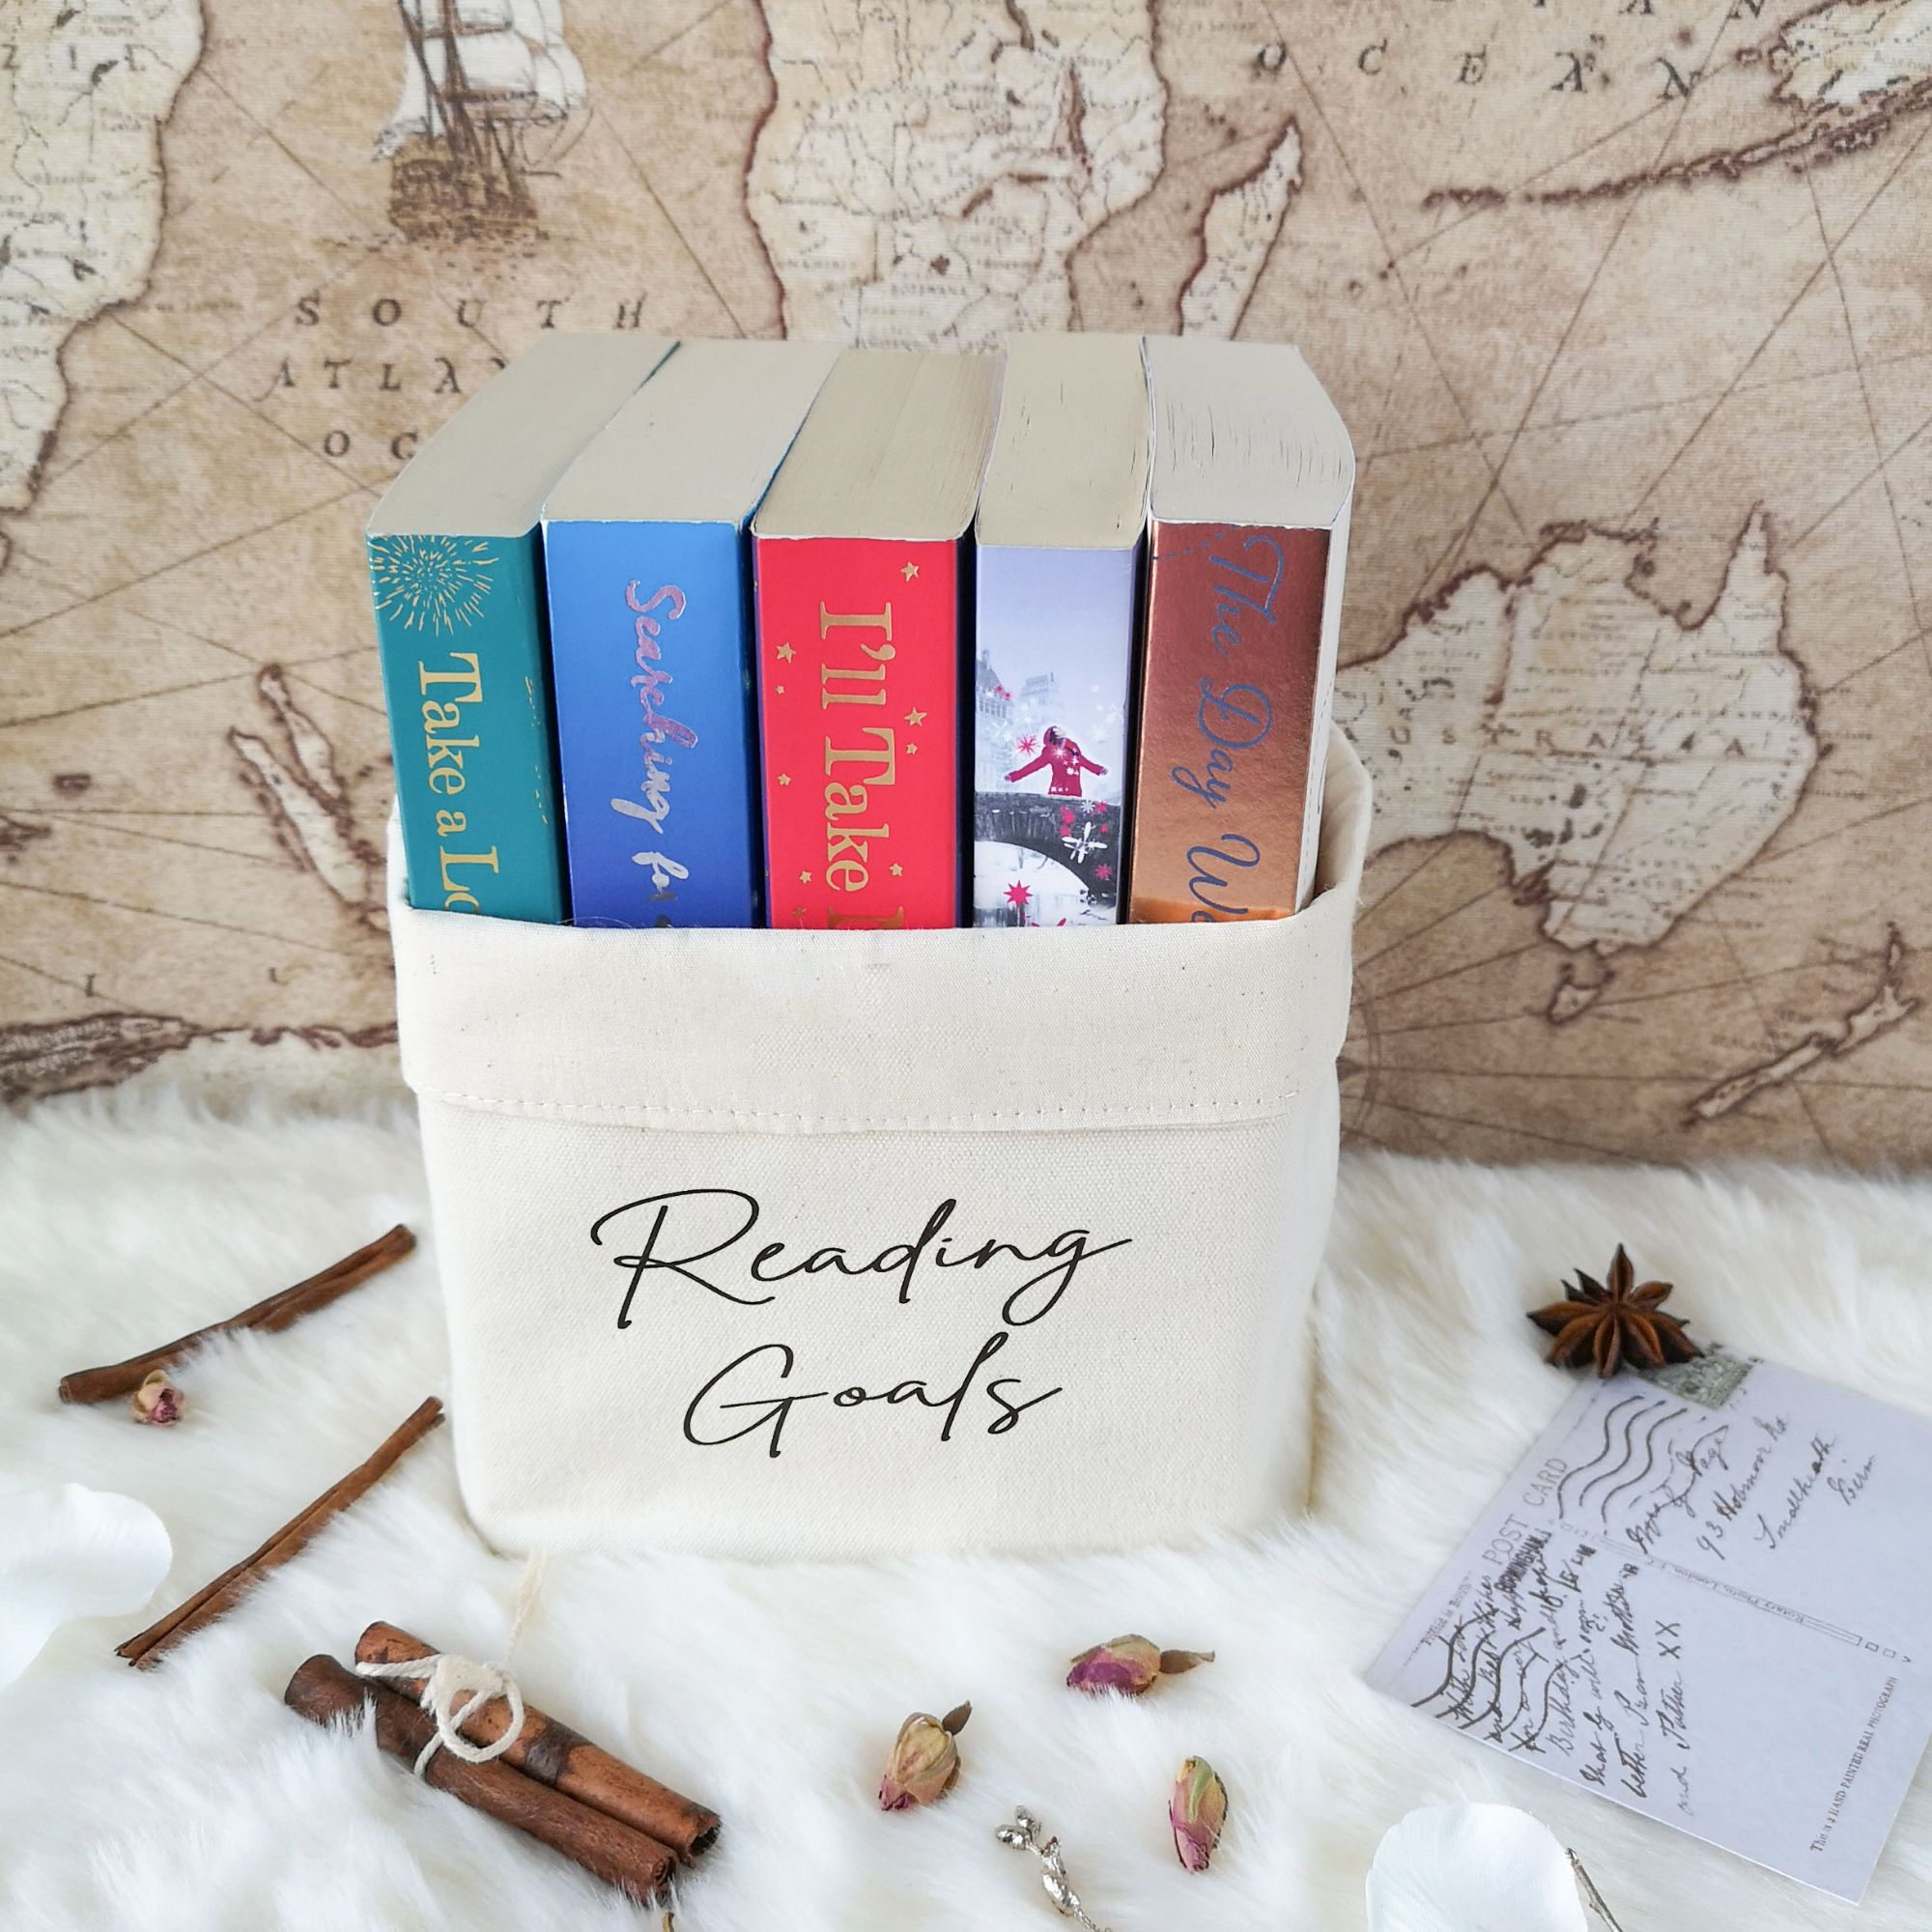 Reading Goals Book Basket